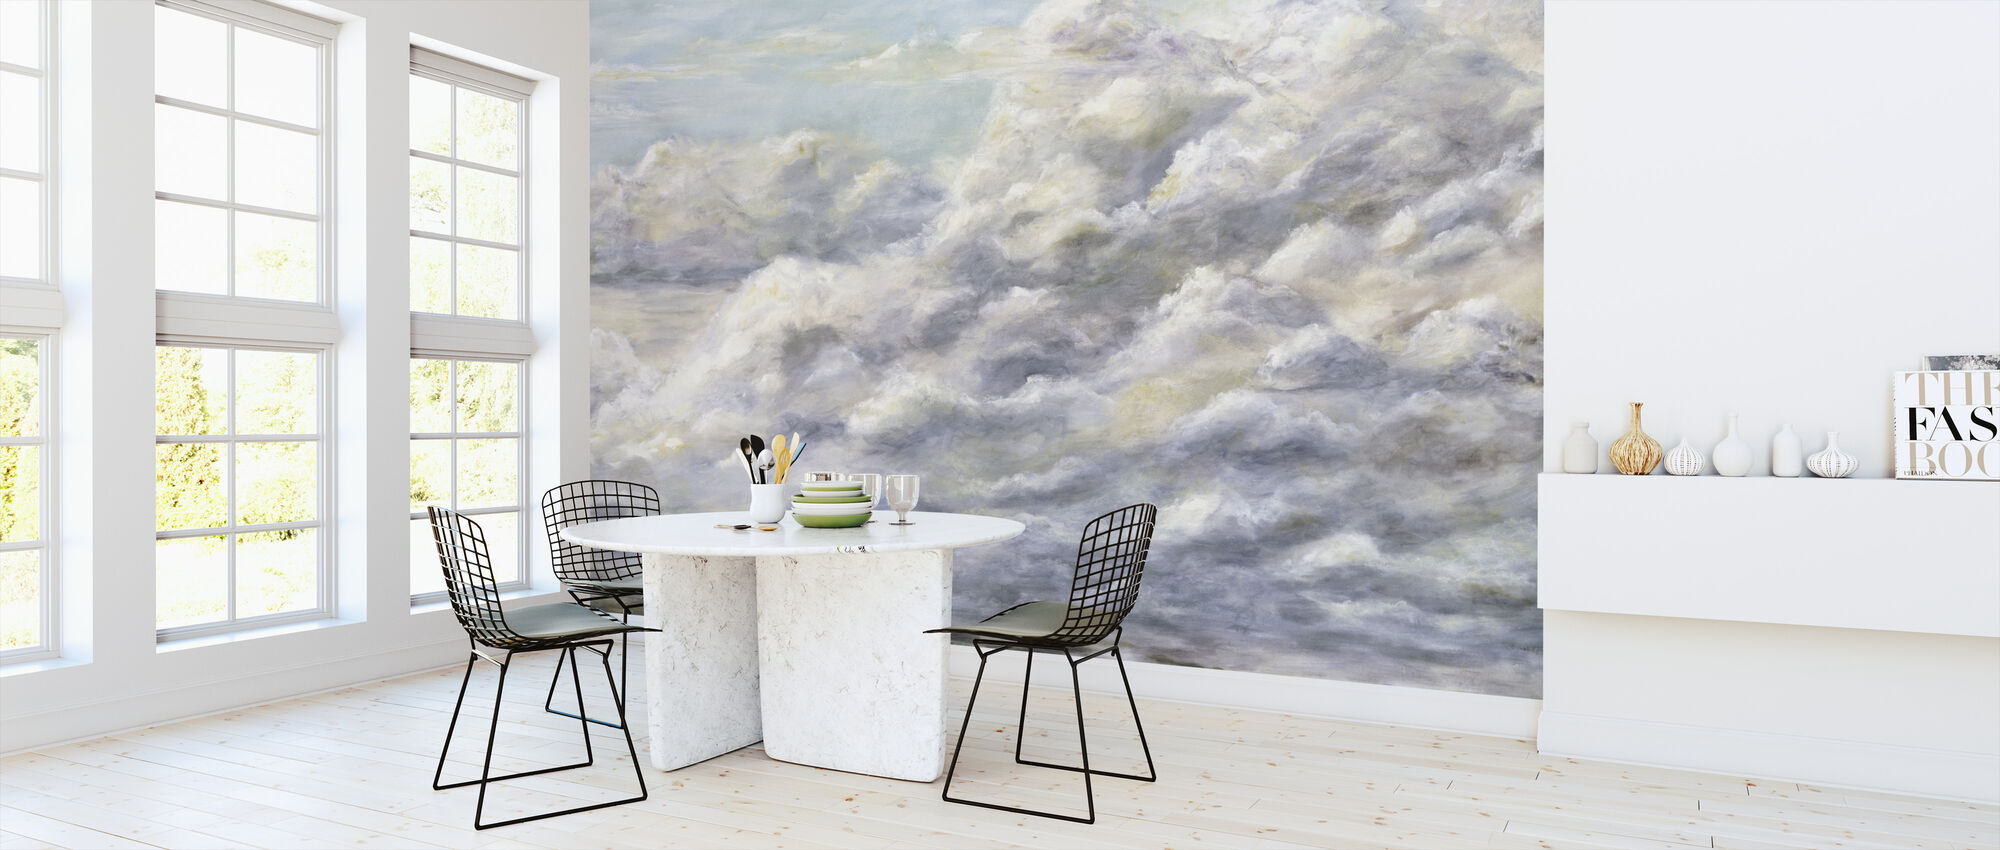 Second Home - Diantha York-Ripley - Wallpaper - Kitchen